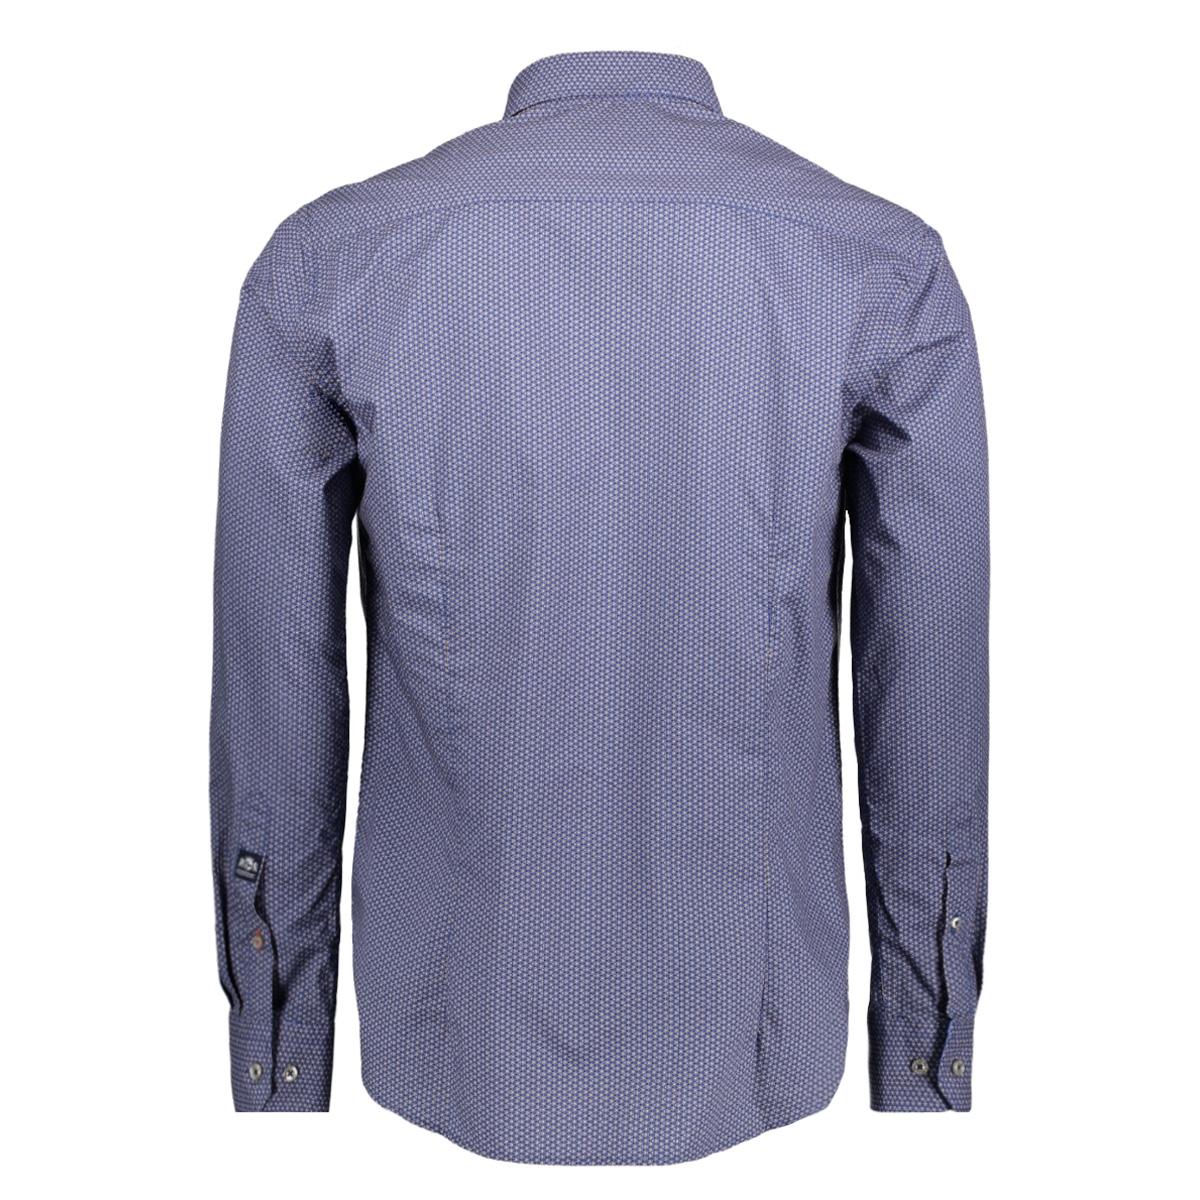 214-17810 state of art overhemd 5784